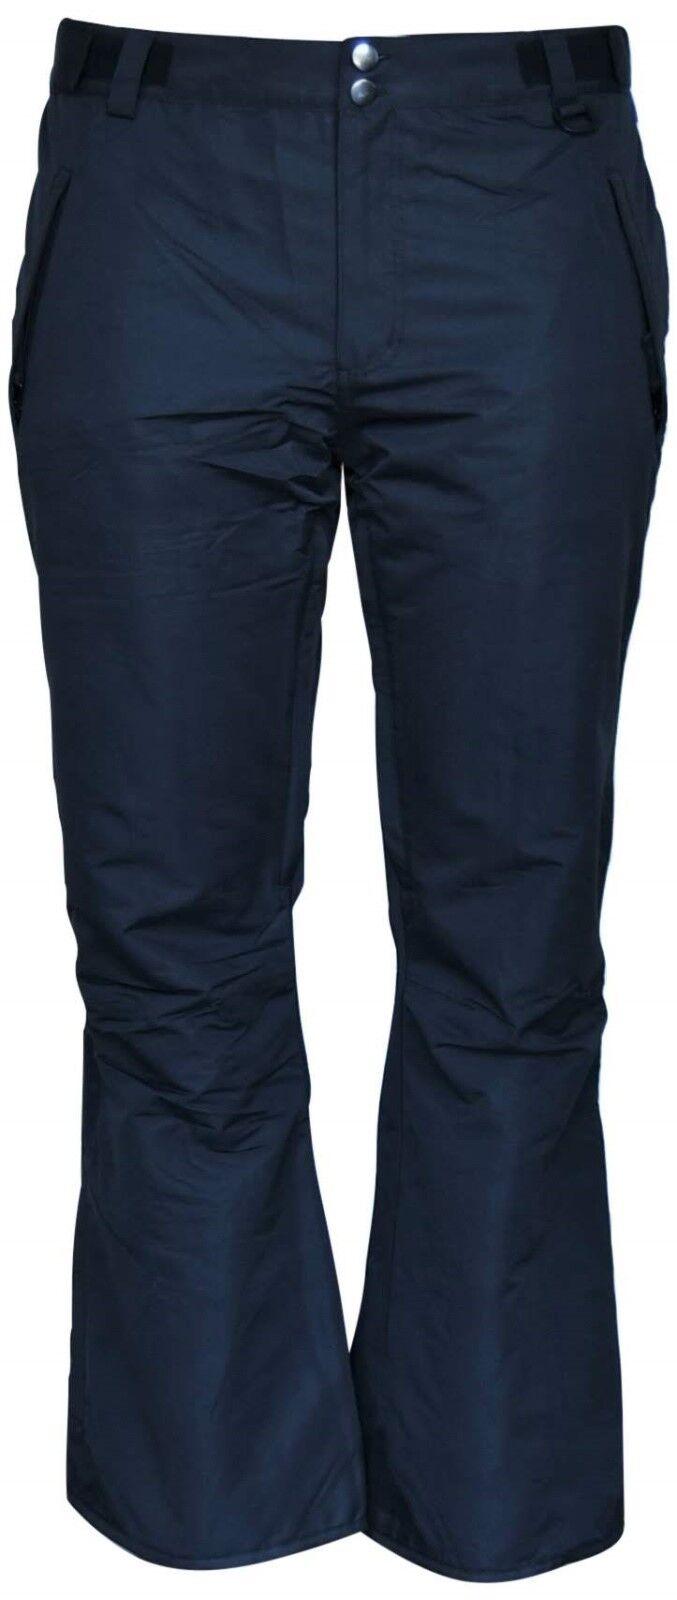 New Snow Country Outerwear Women's 1X 2X 3X 4X 5X 6X Plus Size Ski Pants